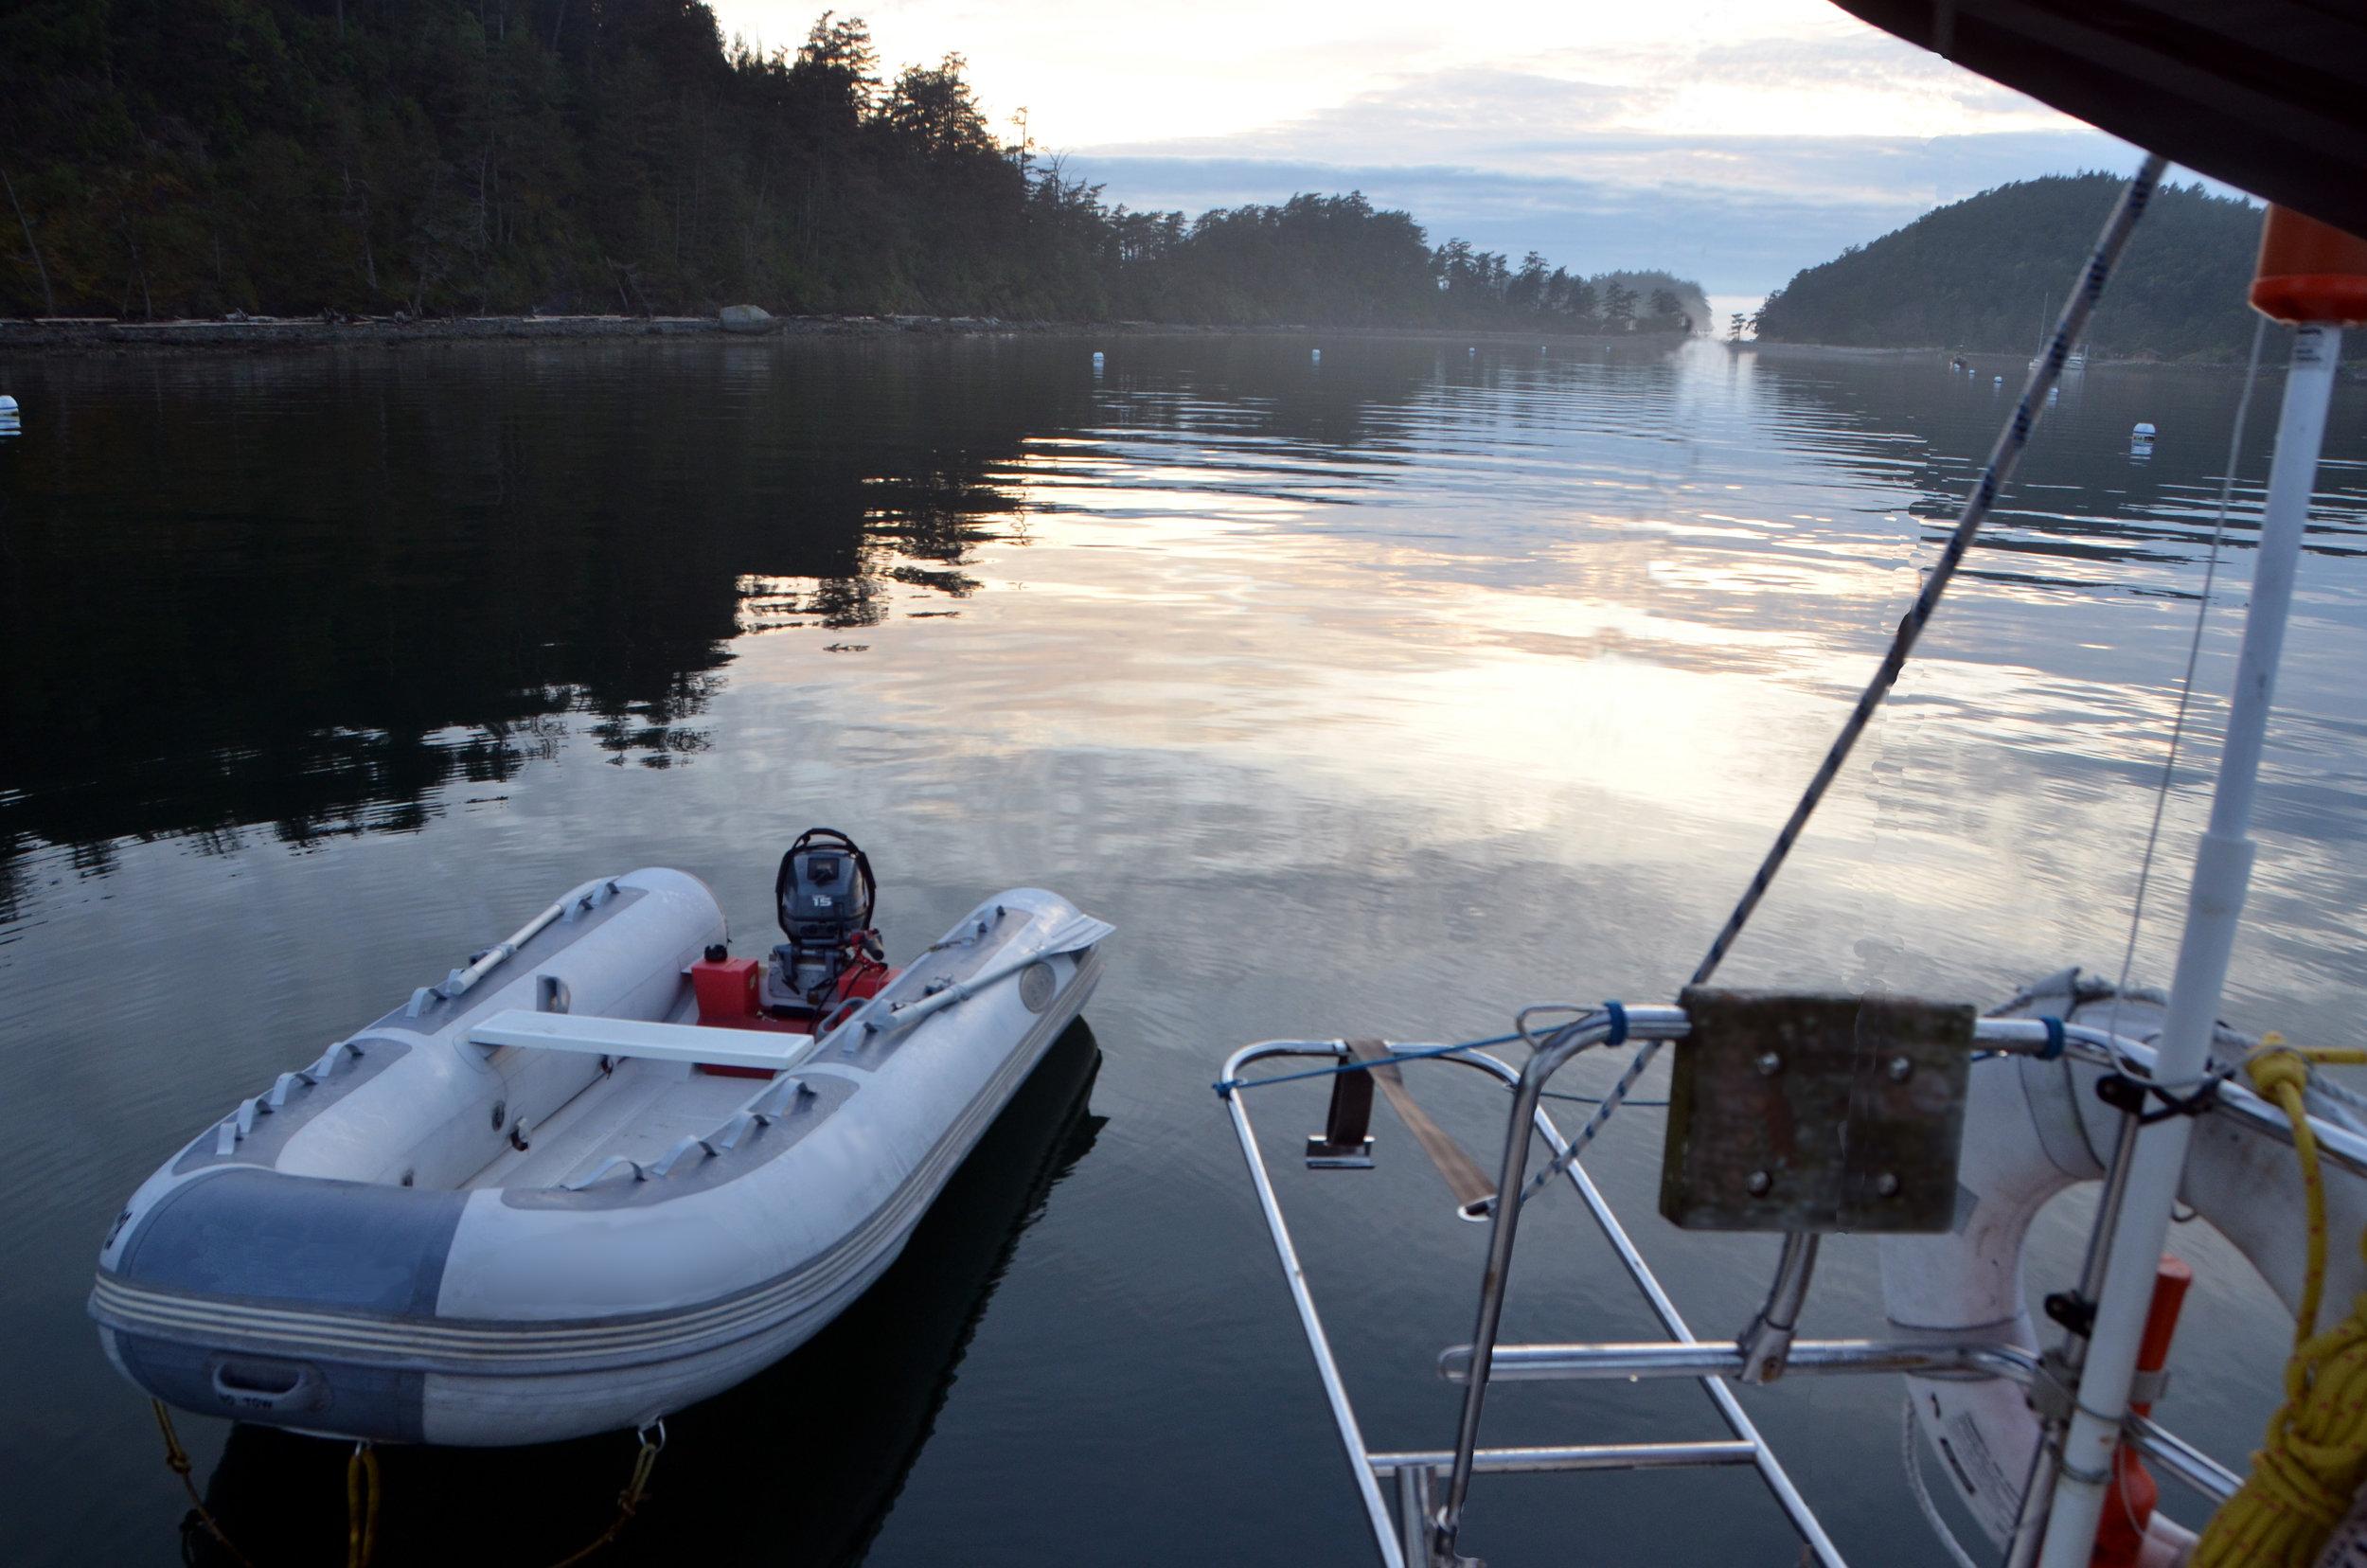 Safe, easy loading of outboard motor to dinghy (photo: Sucia Island, Washington State)